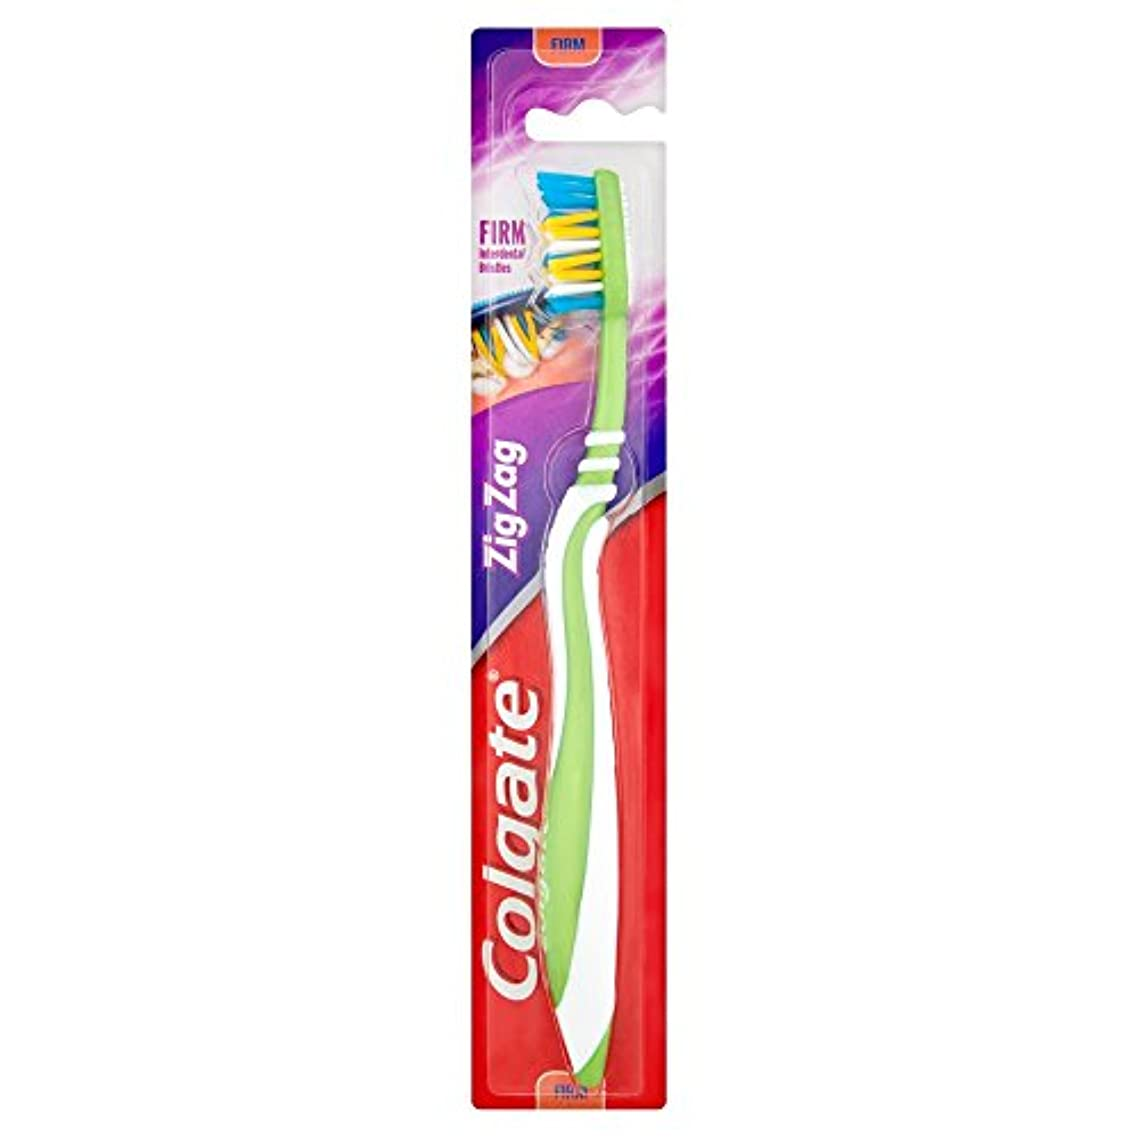 [Colgate ] コルゲートジグザグしっかり歯ブラシ - Colgate Zig Zag Firm Toothbrush [並行輸入品]